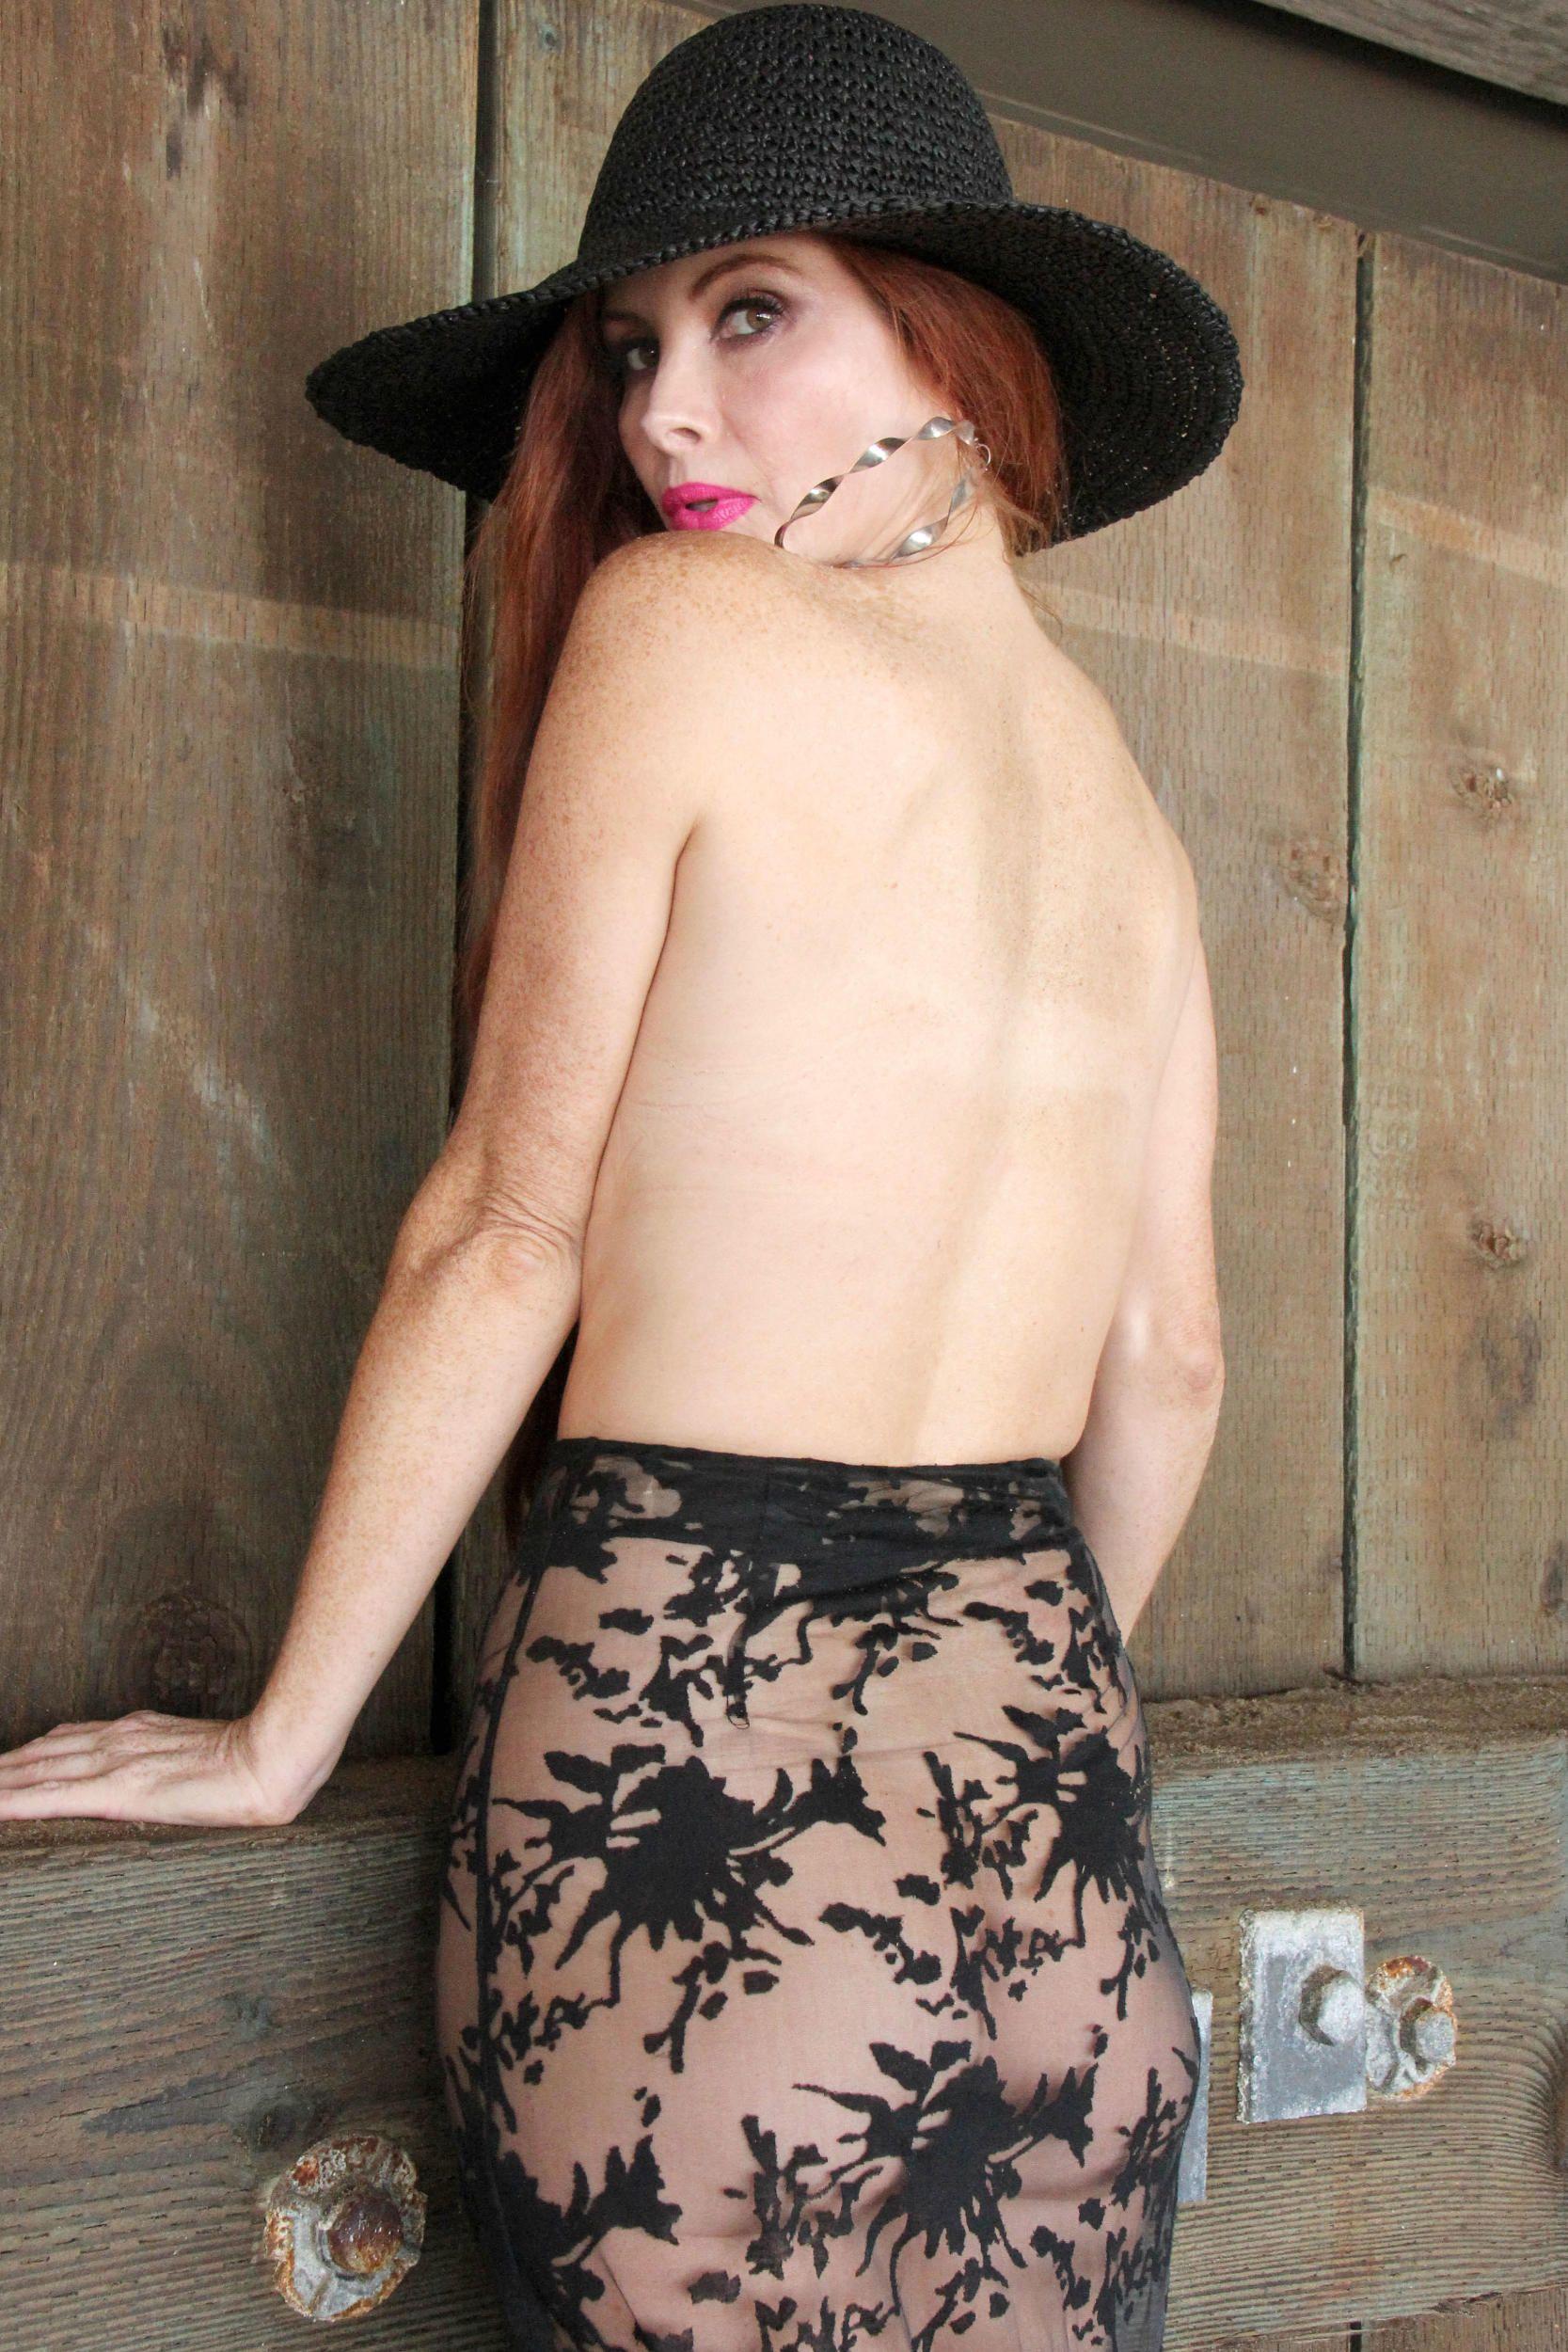 Phoebe-Price-Topless-8 (1)